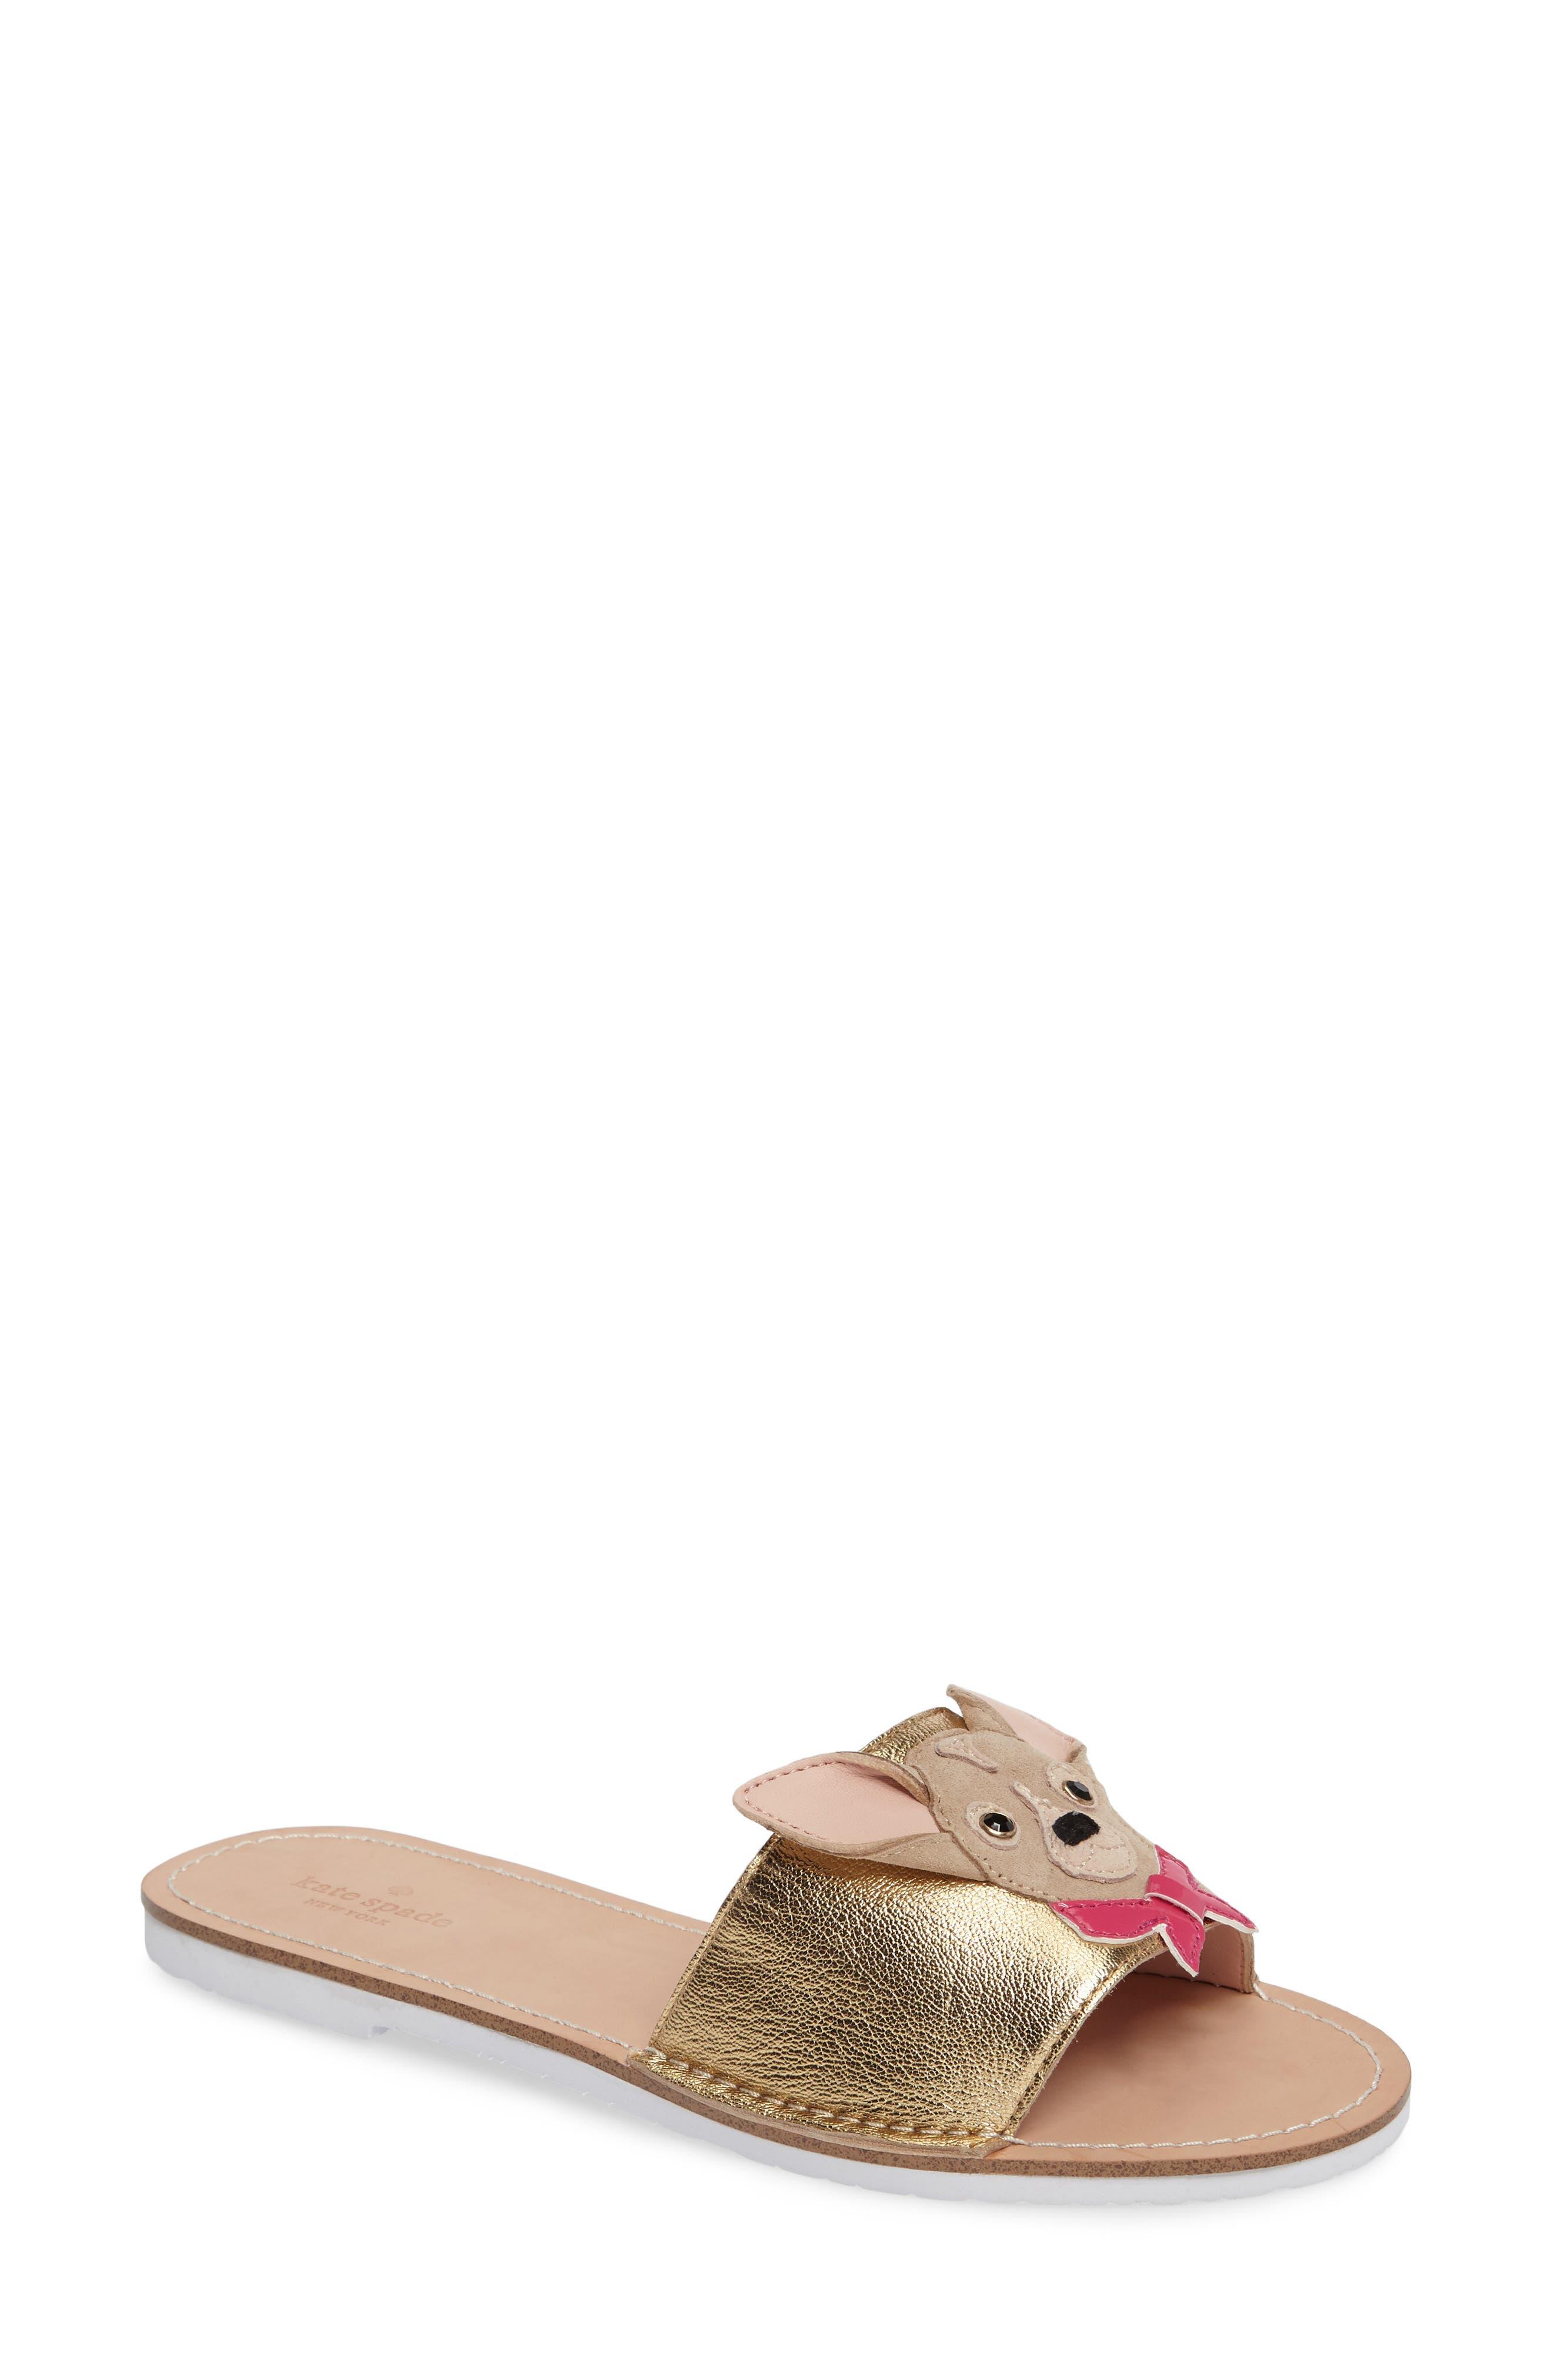 kate spade new york isadore chihuahua slide sandal (Women)